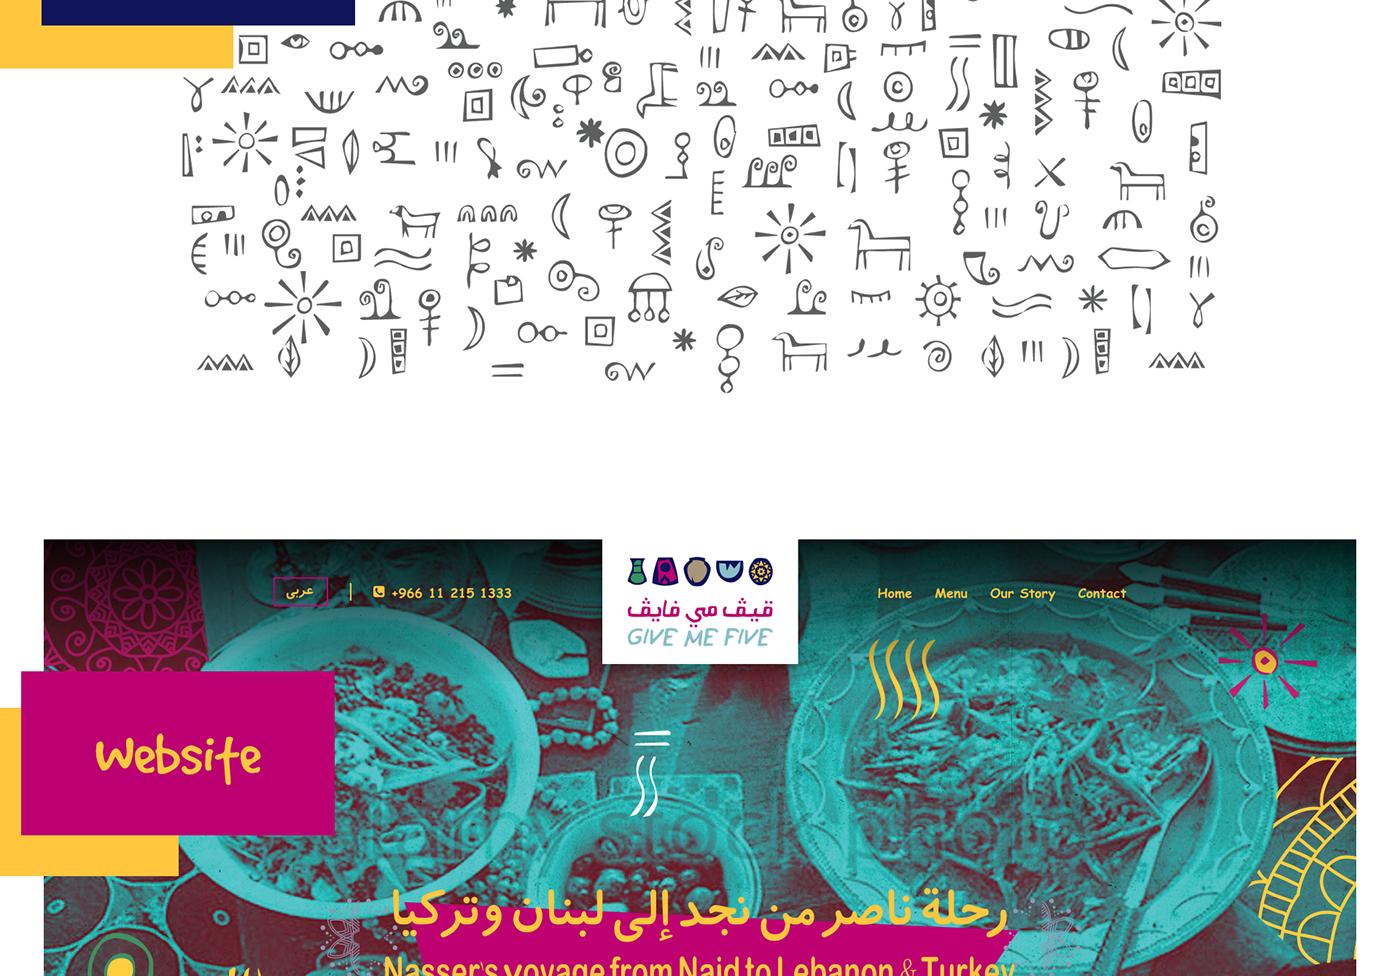 UI ux UI/UX xD illustrations icons restaurant wordpress user interface user experience